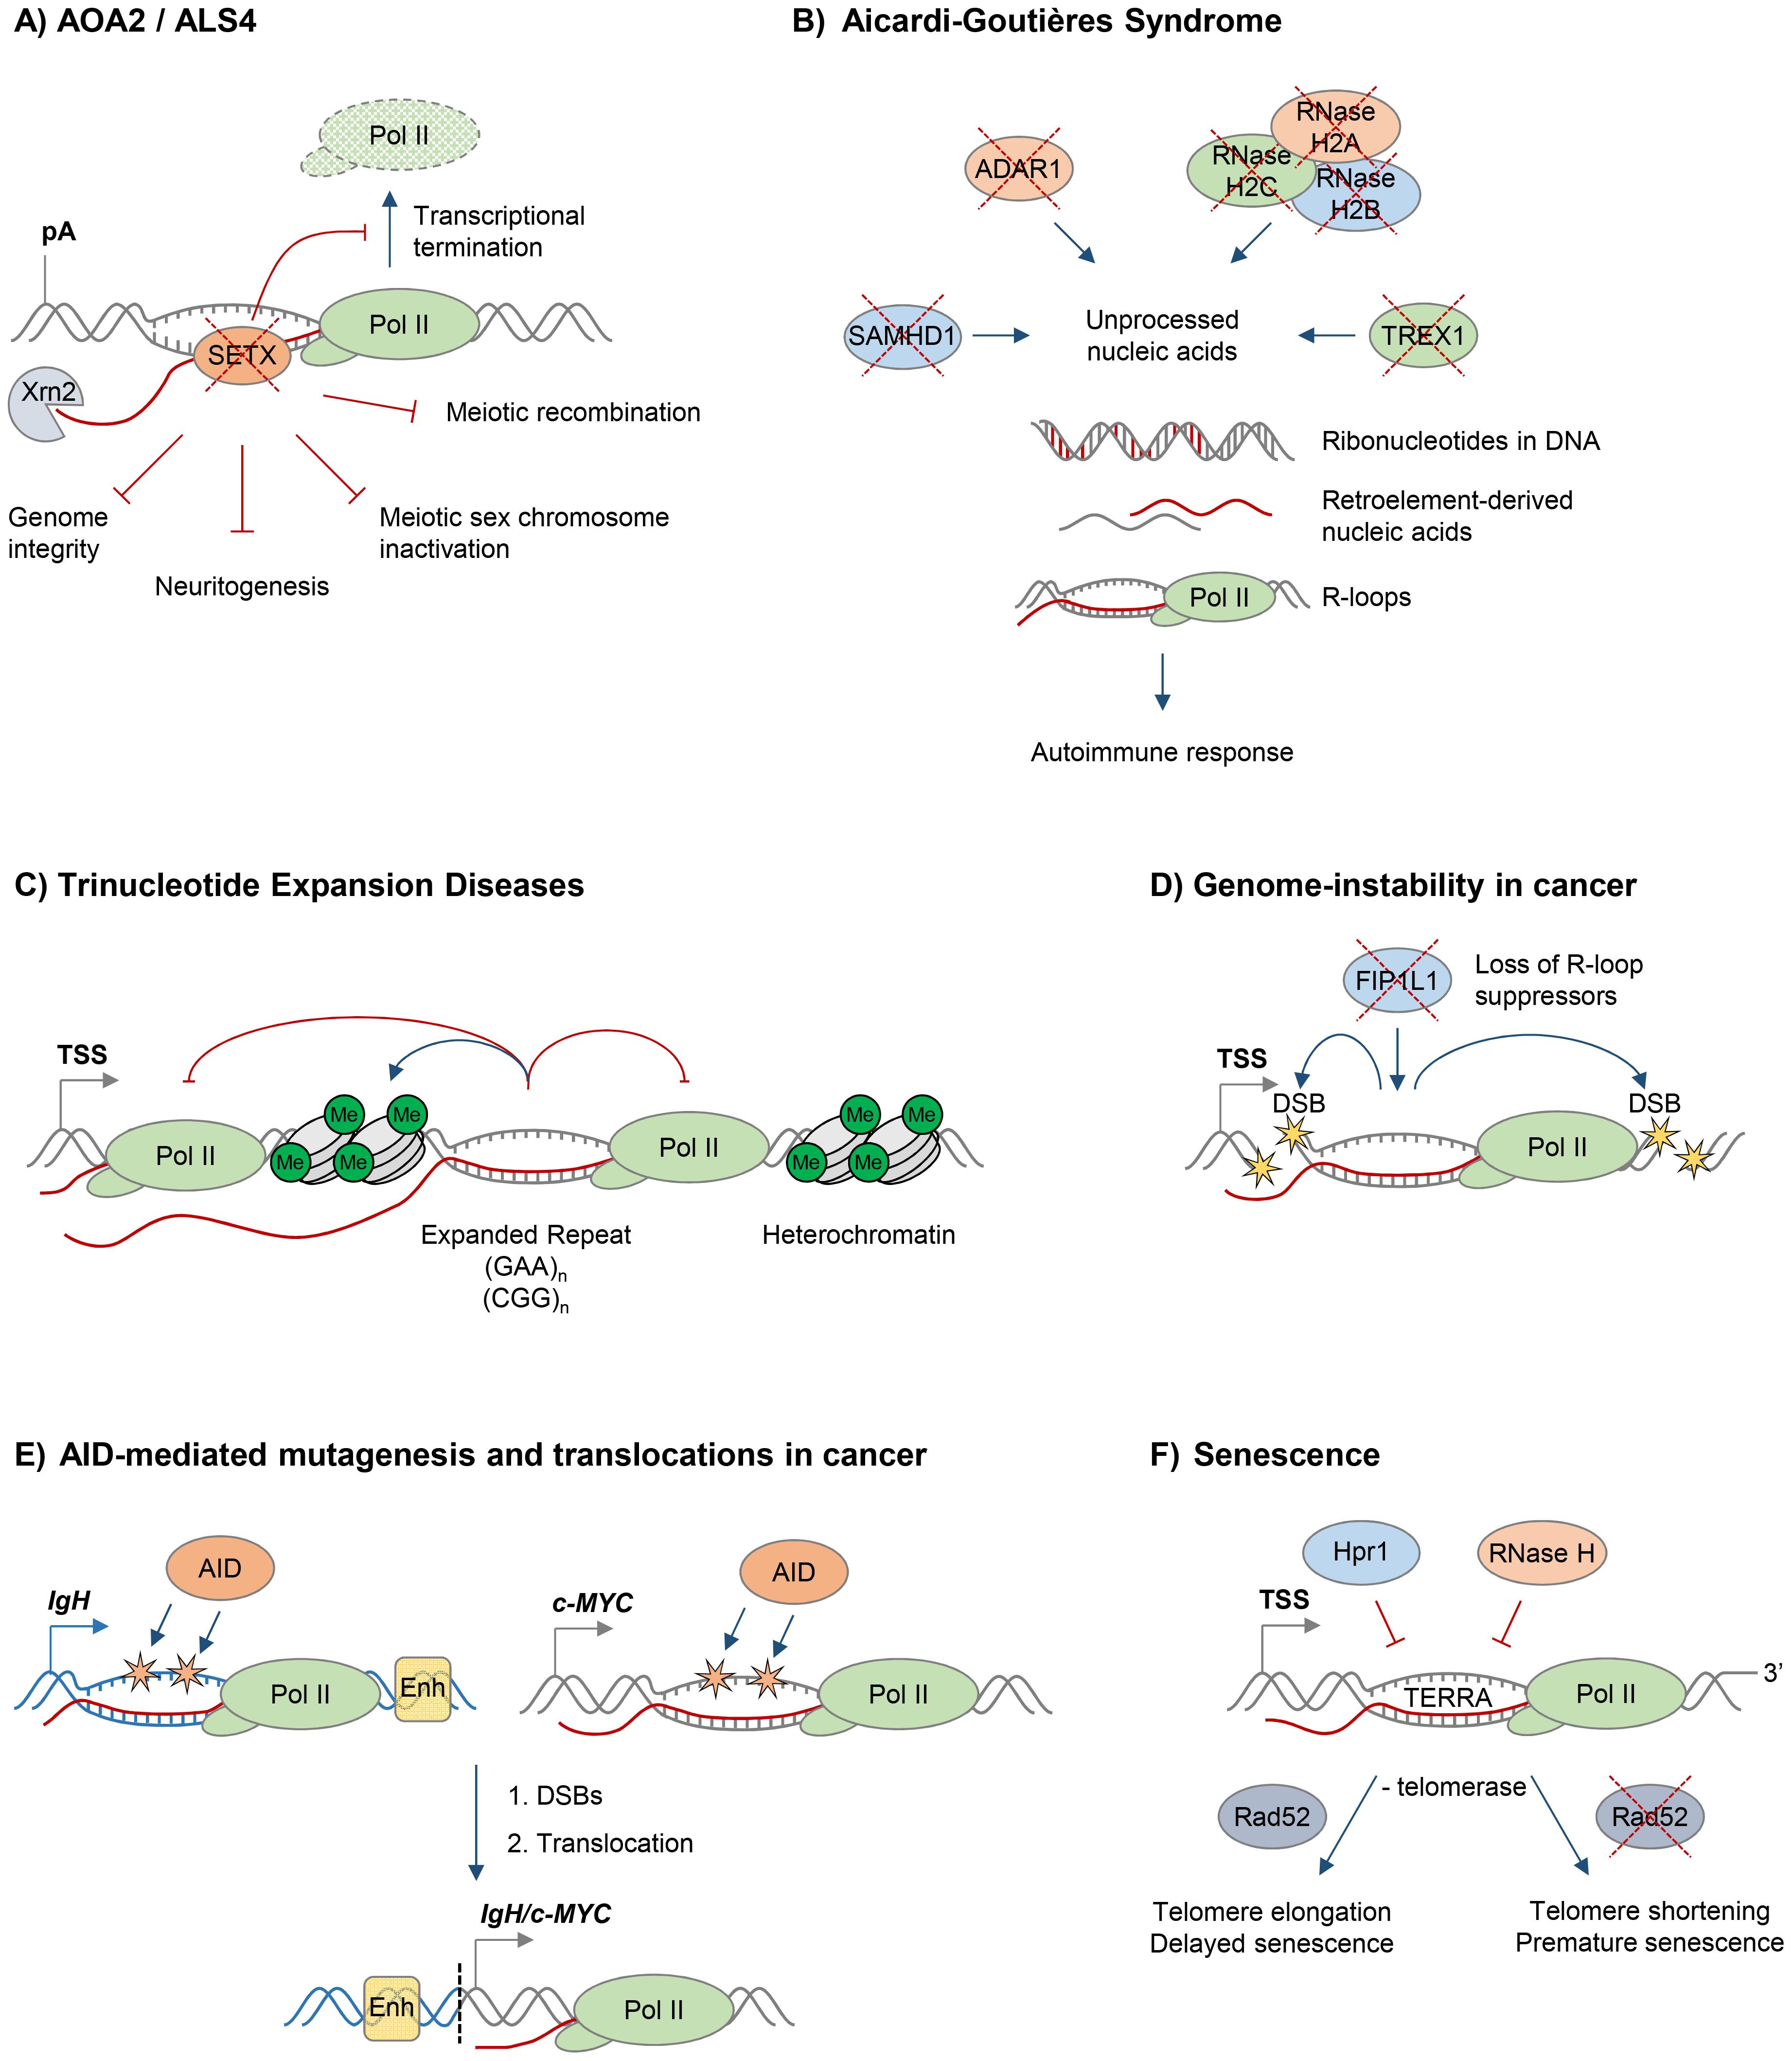 R-loops and human diseases.